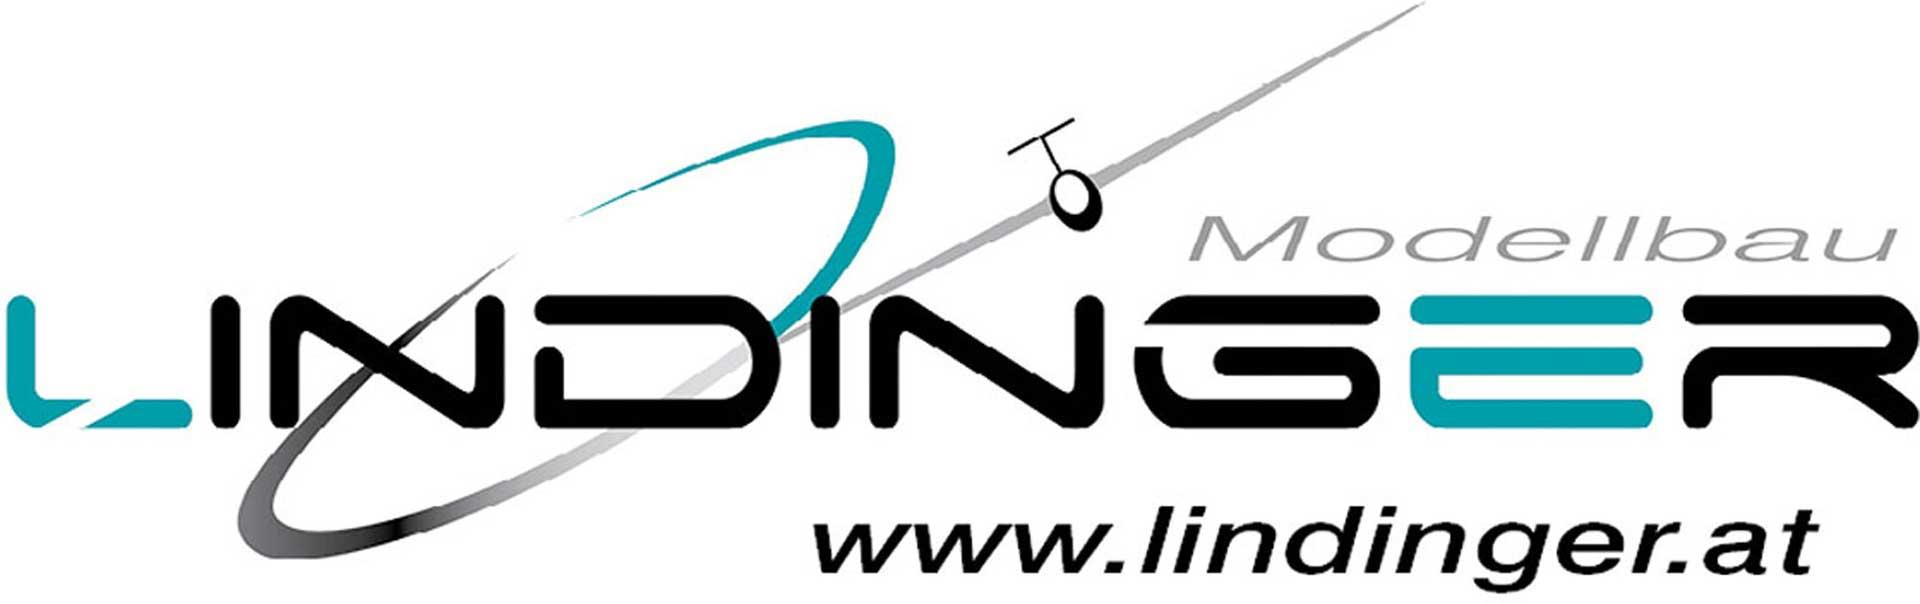 PLANET-HOBBY LINDINGER STICKER LARGE TRANSPARENT 160X52MM